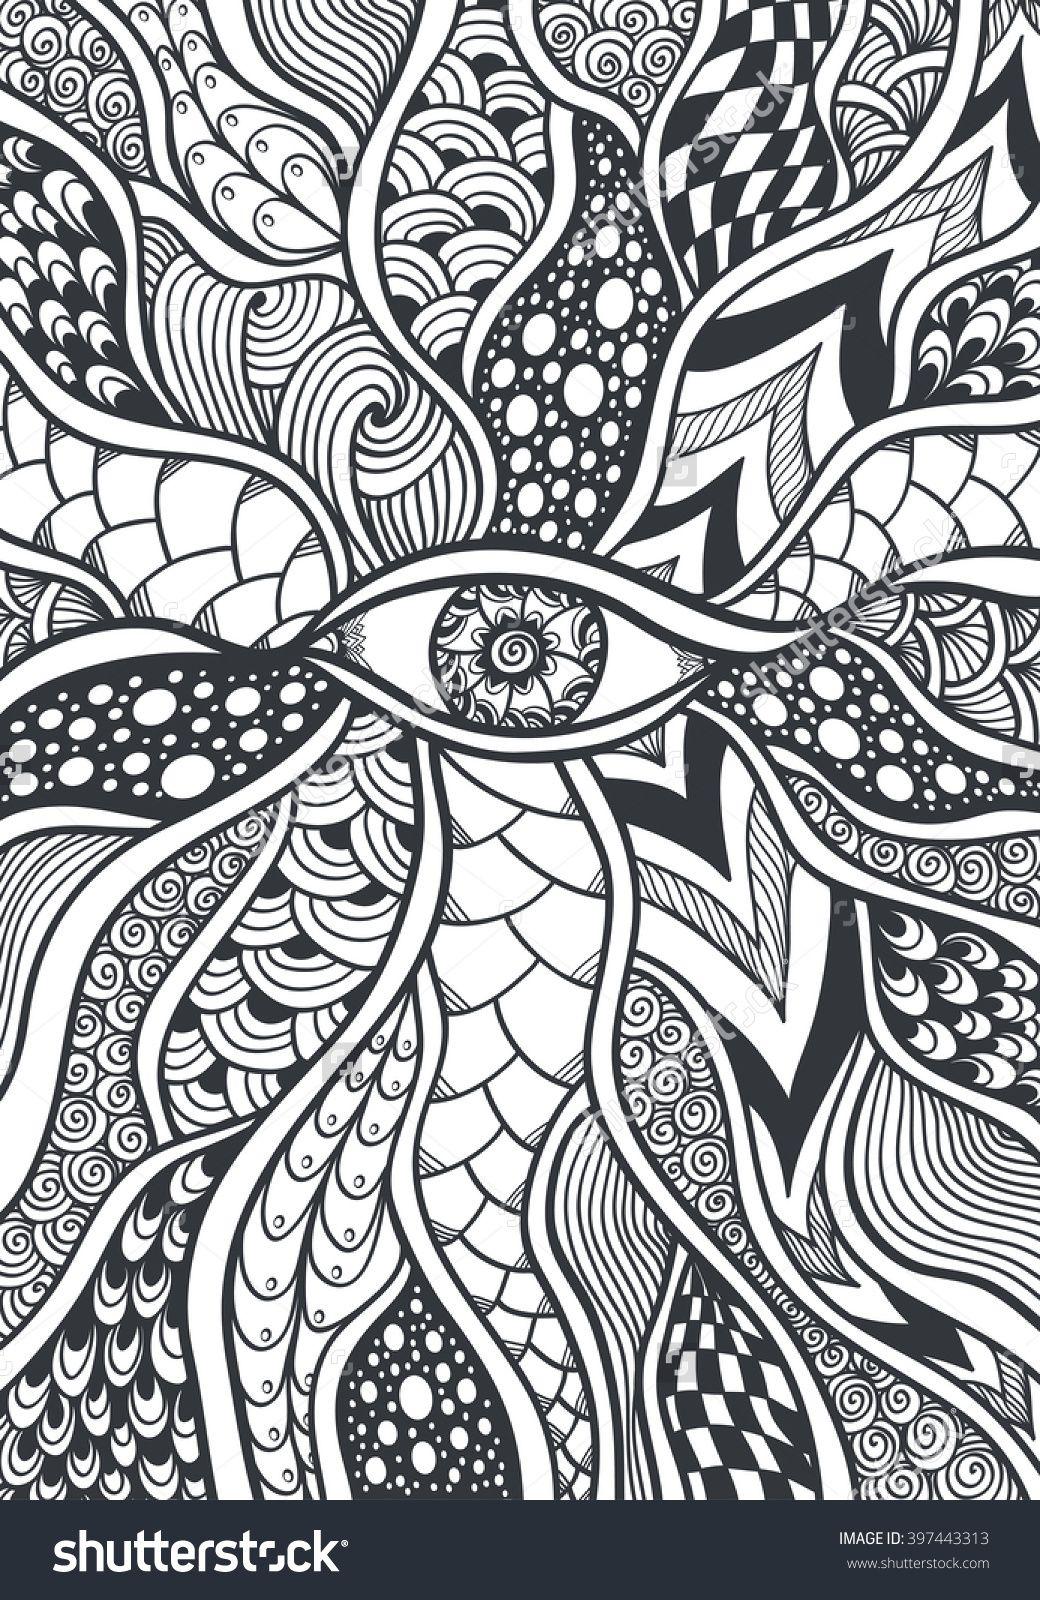 Zen-Doodle Eye Coloring Page 397443313 : Shutterstock in ...